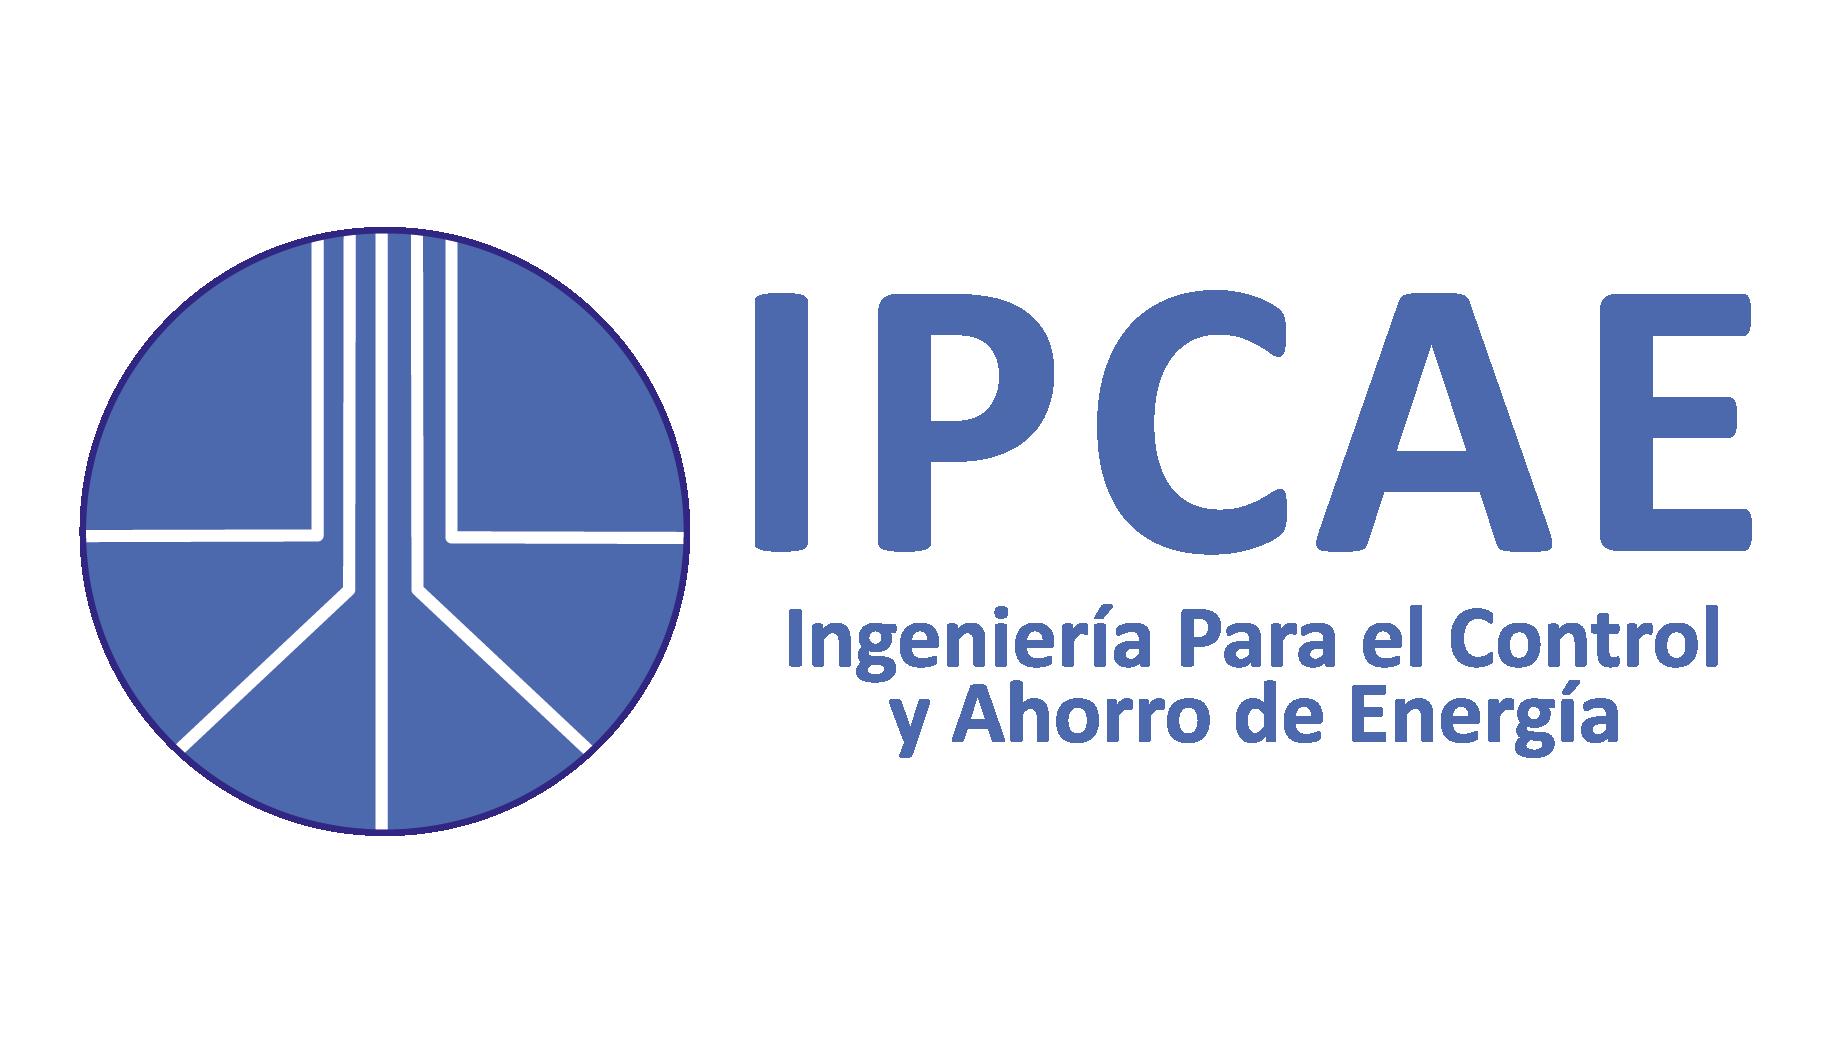 IPCAE